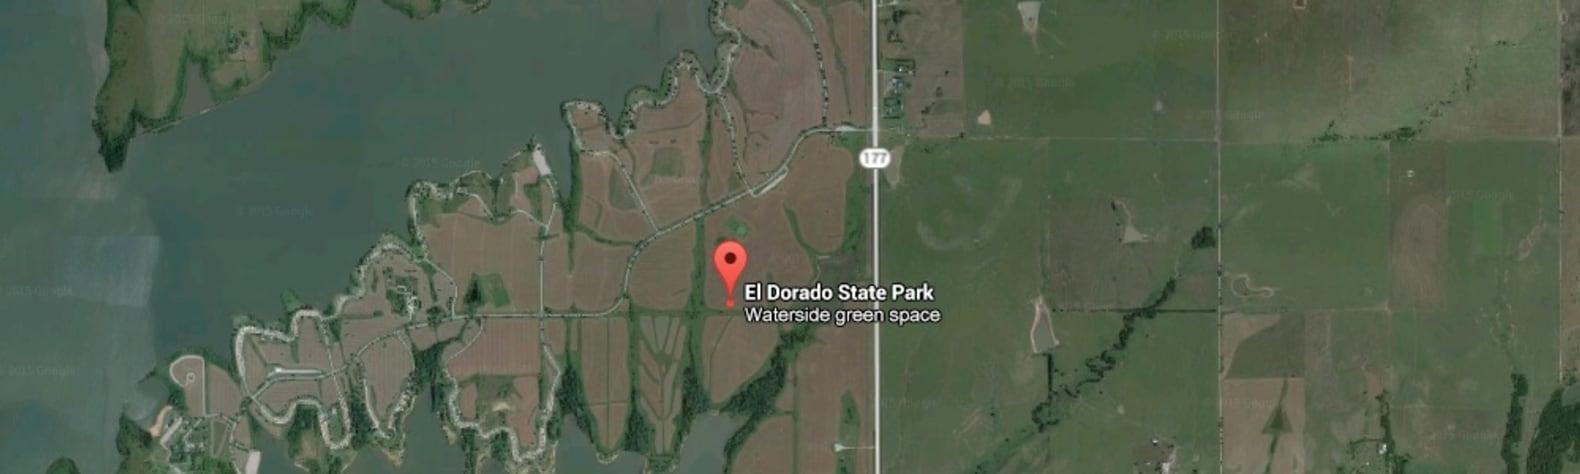 El Dorado State Park